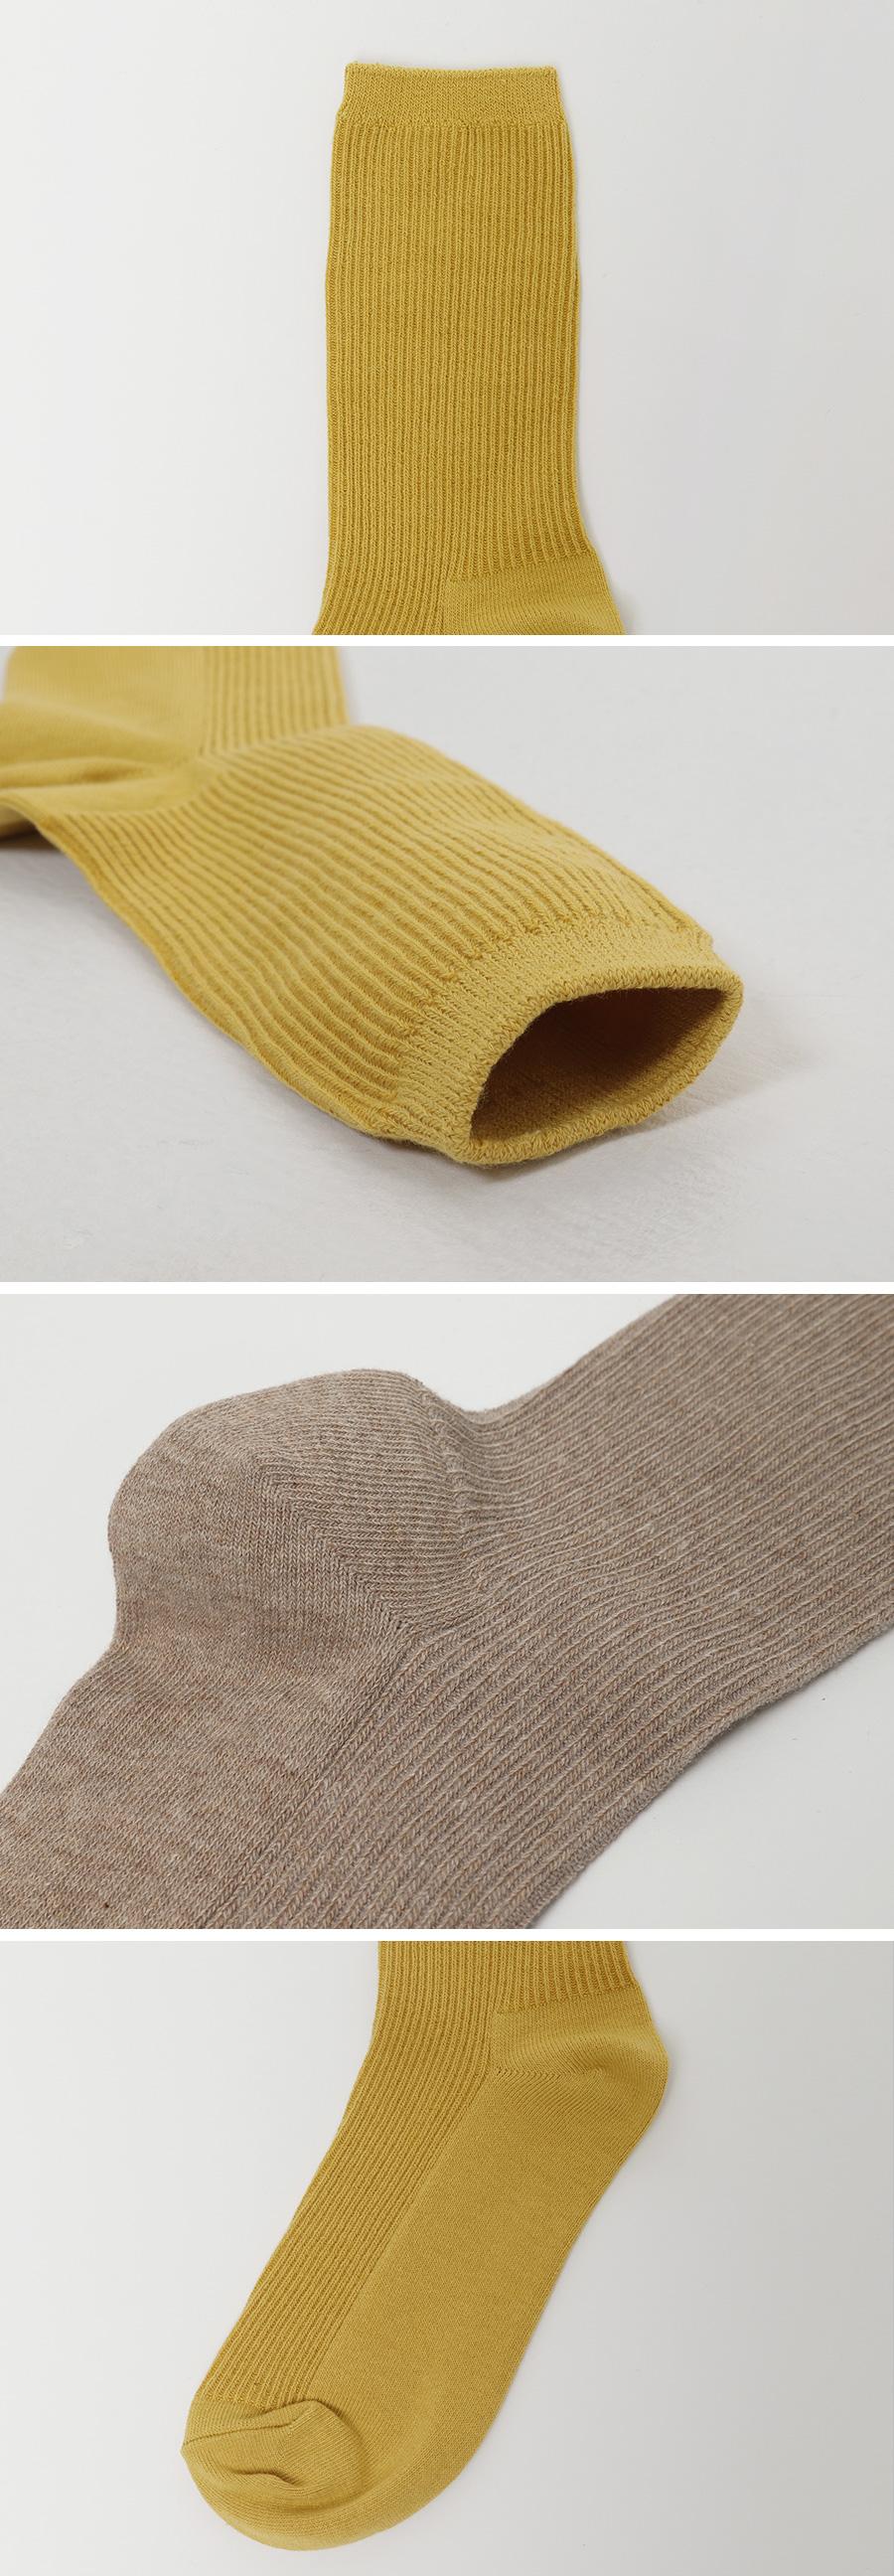 Mood color daily Ribbed socks